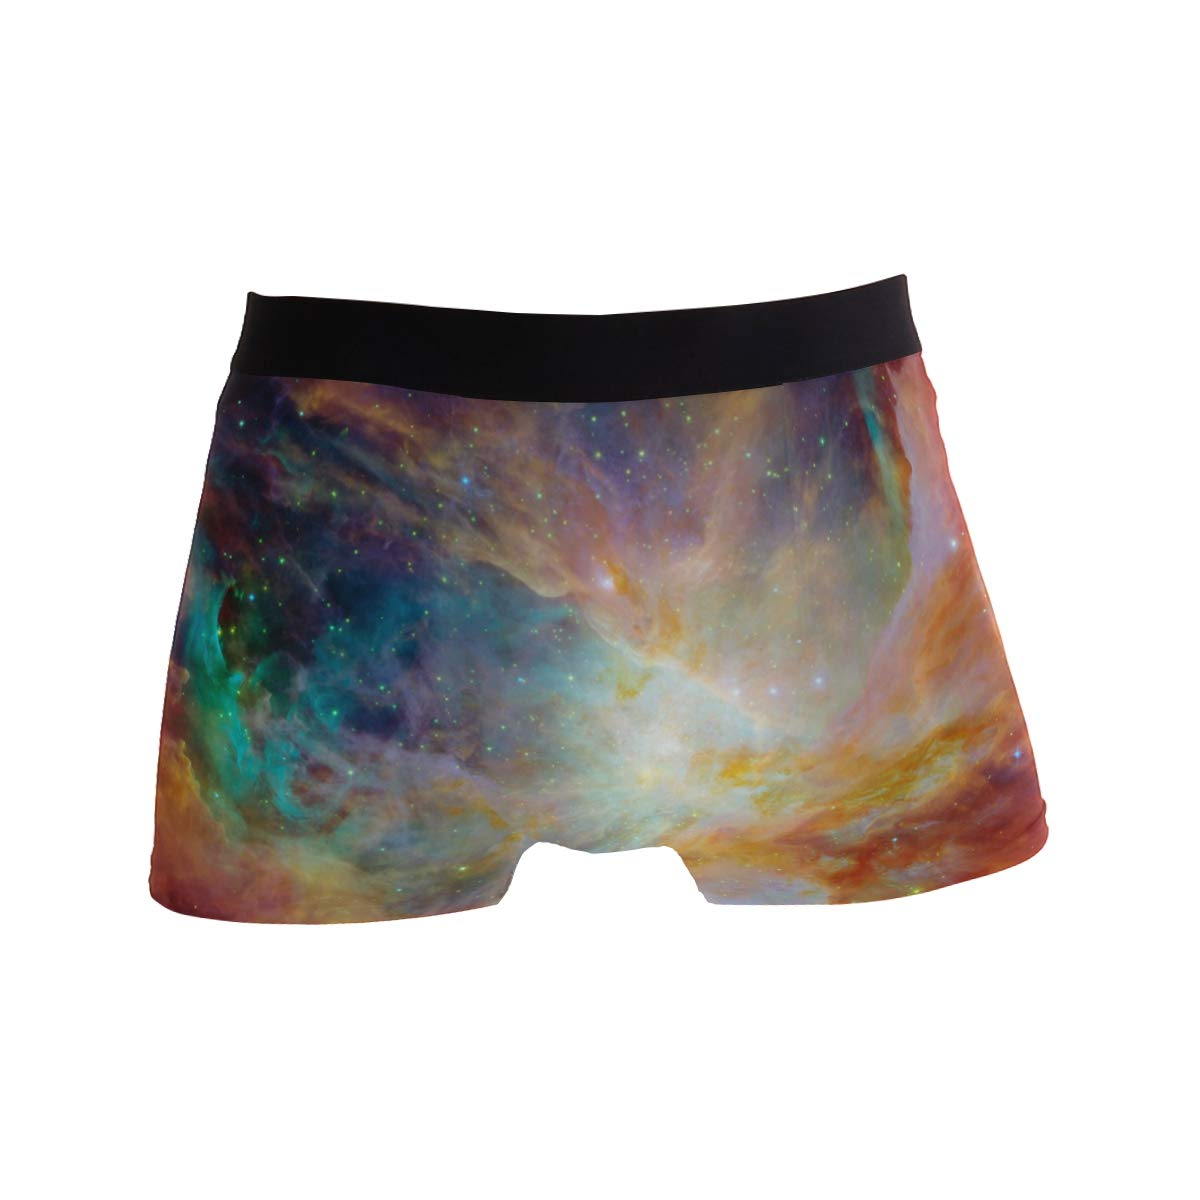 BETTKEN Mens Boxer Briefs Universe Space Galaxy Space Short Underwear Soft Stretch Underpants for Men Boys S-XL